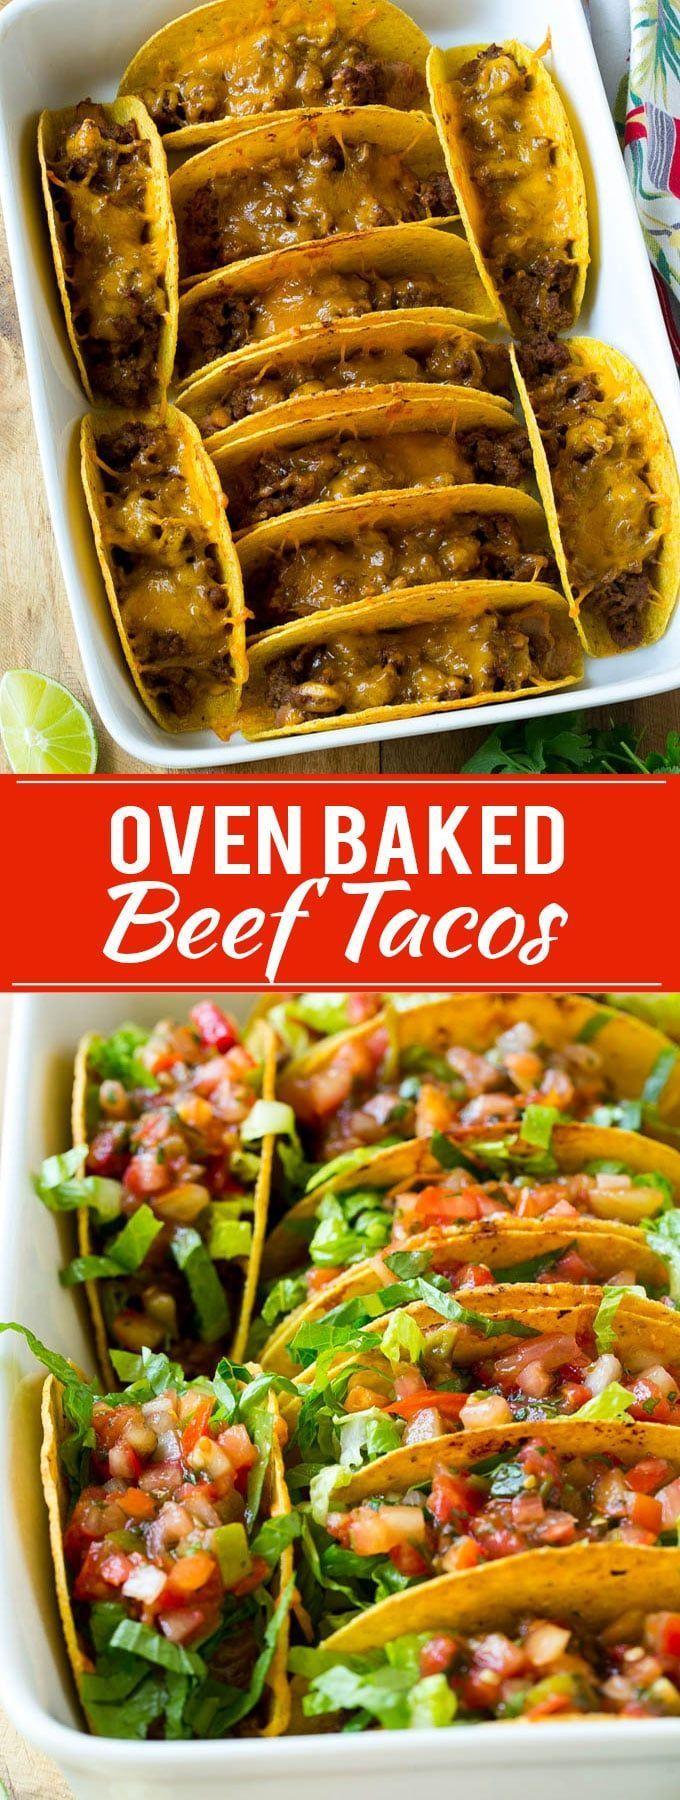 Gebackene Rindfleisch Tacos -  Ofen + Gebacken + Rindfleisch + Tacos + Rezept + + Knusprig + Rindfleisch + Tacos + + Rindfleisch + - #antiquedecor #apartmentdecor #bedroomdecor #gebackene #hamburgermeatrecipes #homedecor #mushroomrecipes #pioneerwomanrecipes #ramennoodlerecipes #rindfleisch #sausagerecipes #tacorecipes #tacos #thairecipes #whole30recipes